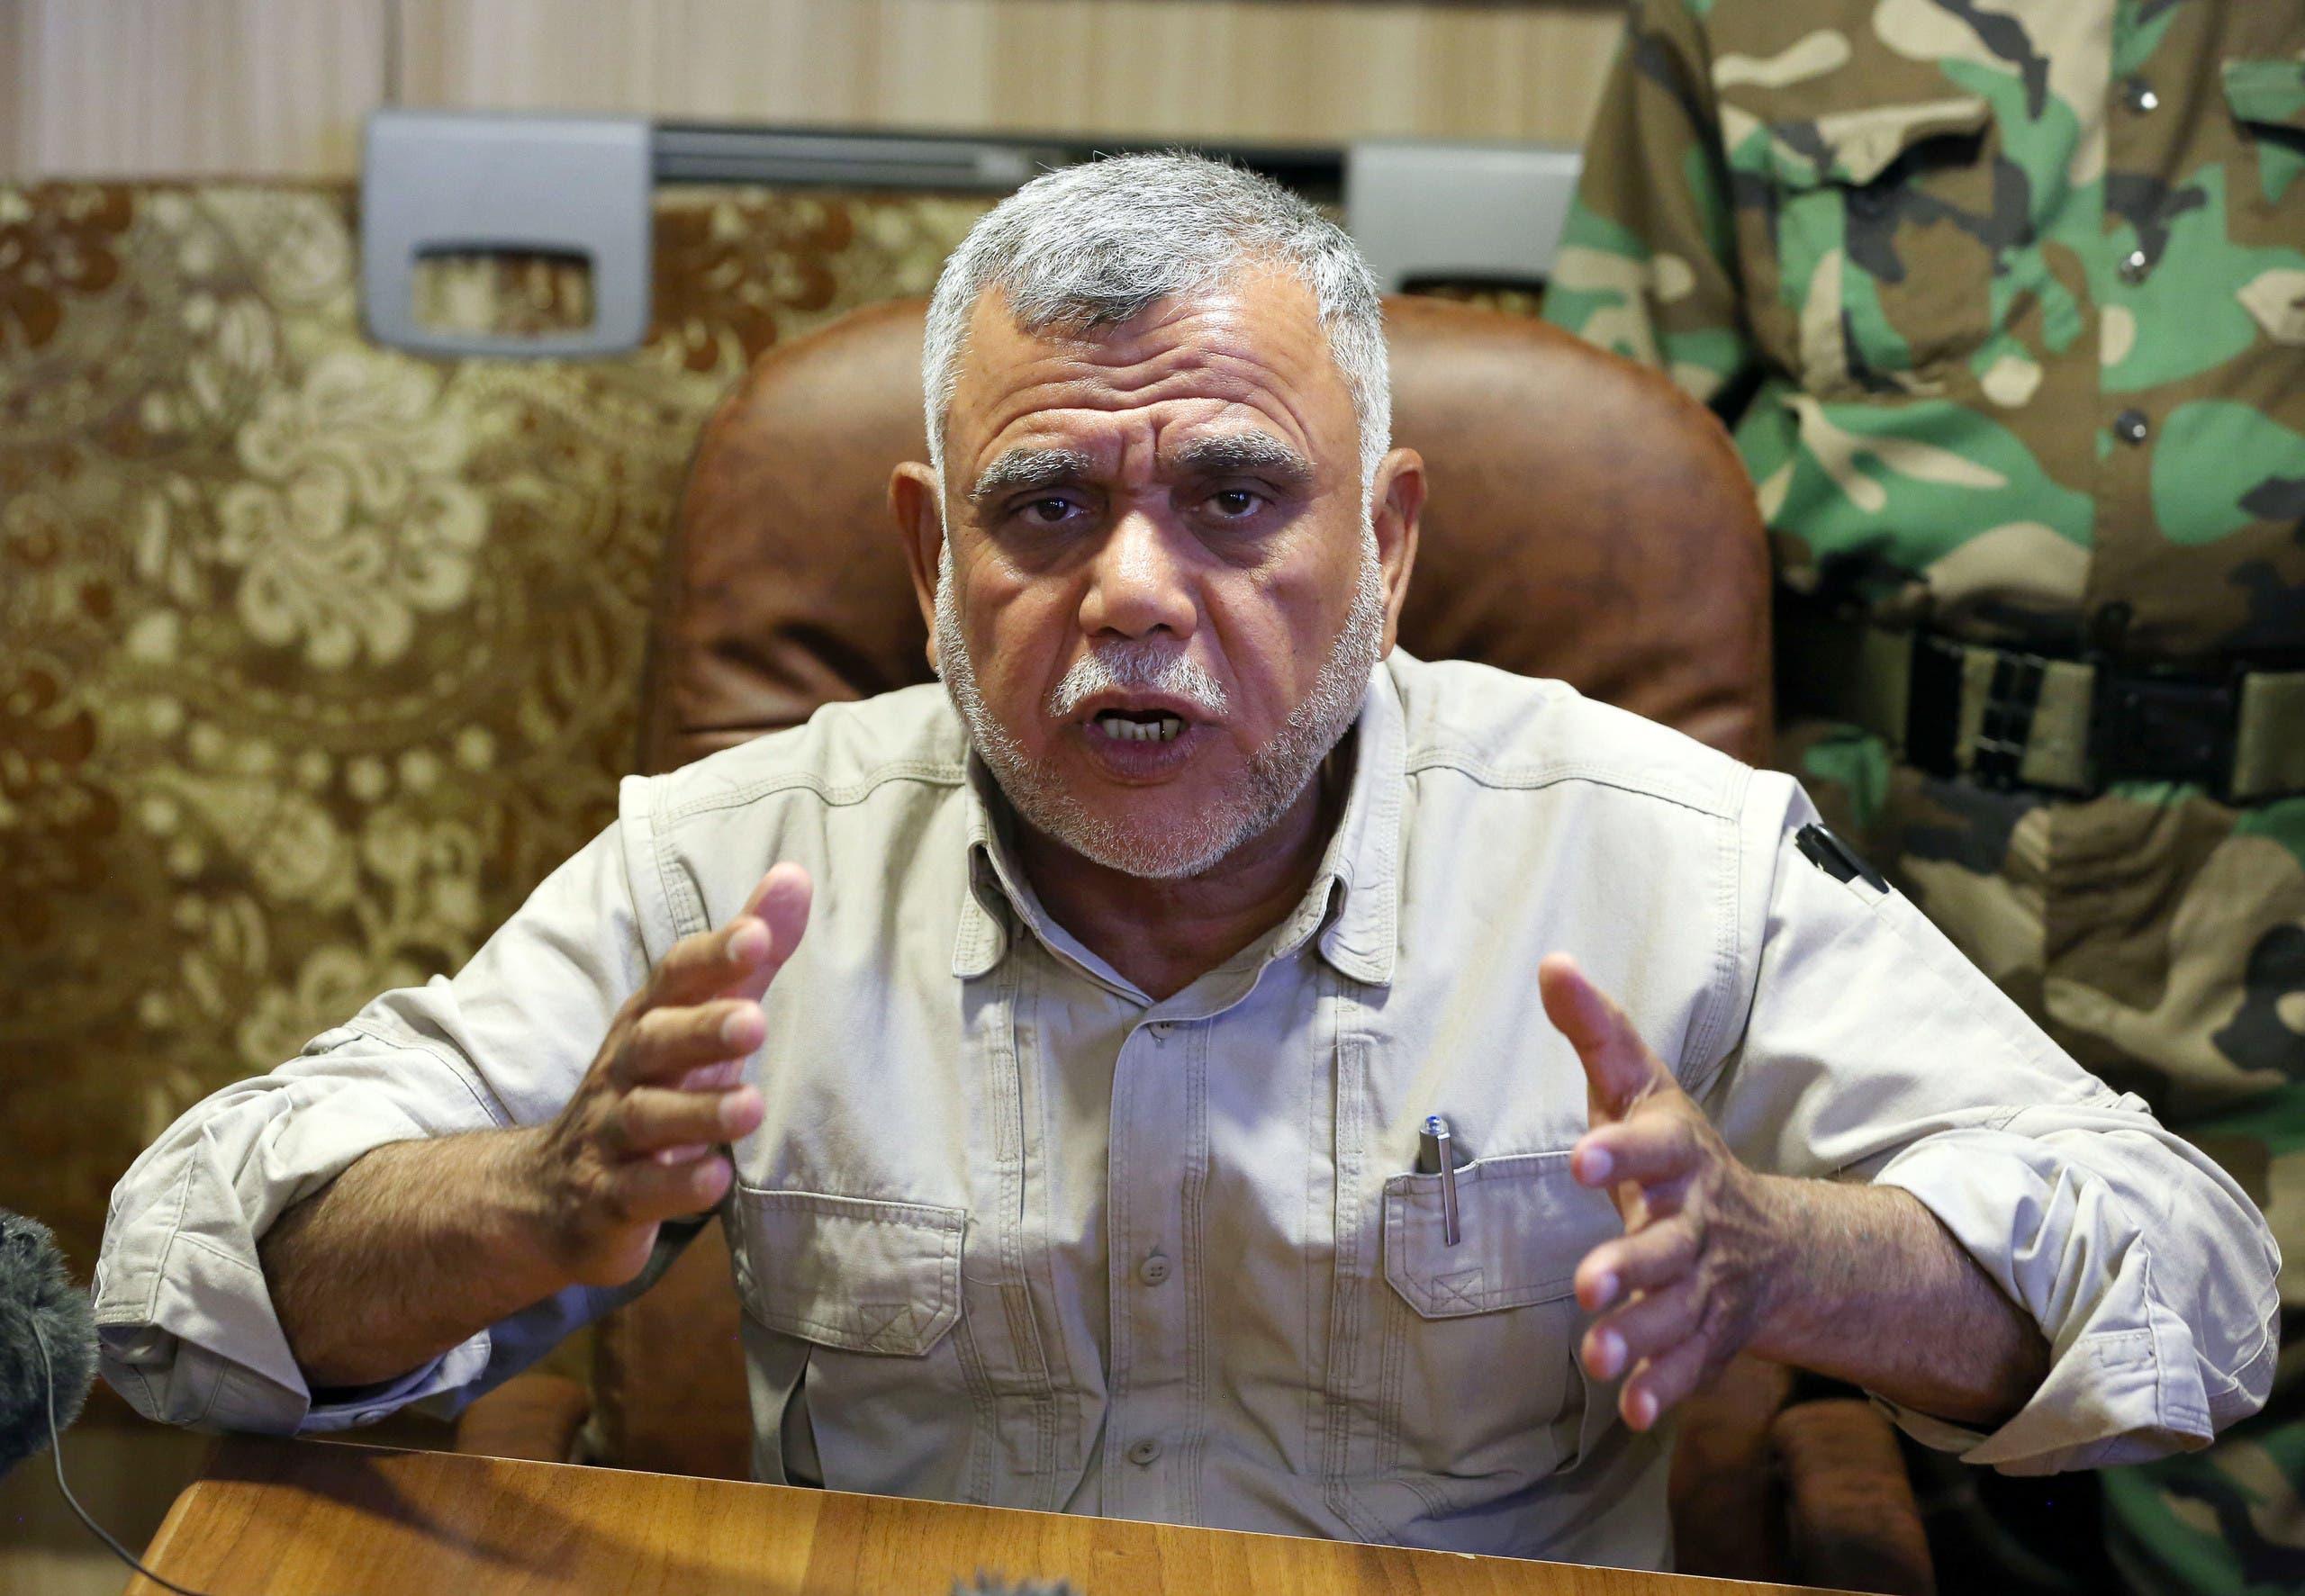 Popular Mobilization Forces commander Hadi al-Amiri speaks to journalists in Nbaie (20 kilometers) of Baghdad, Iraq, Friday, June 12, 2015. ap